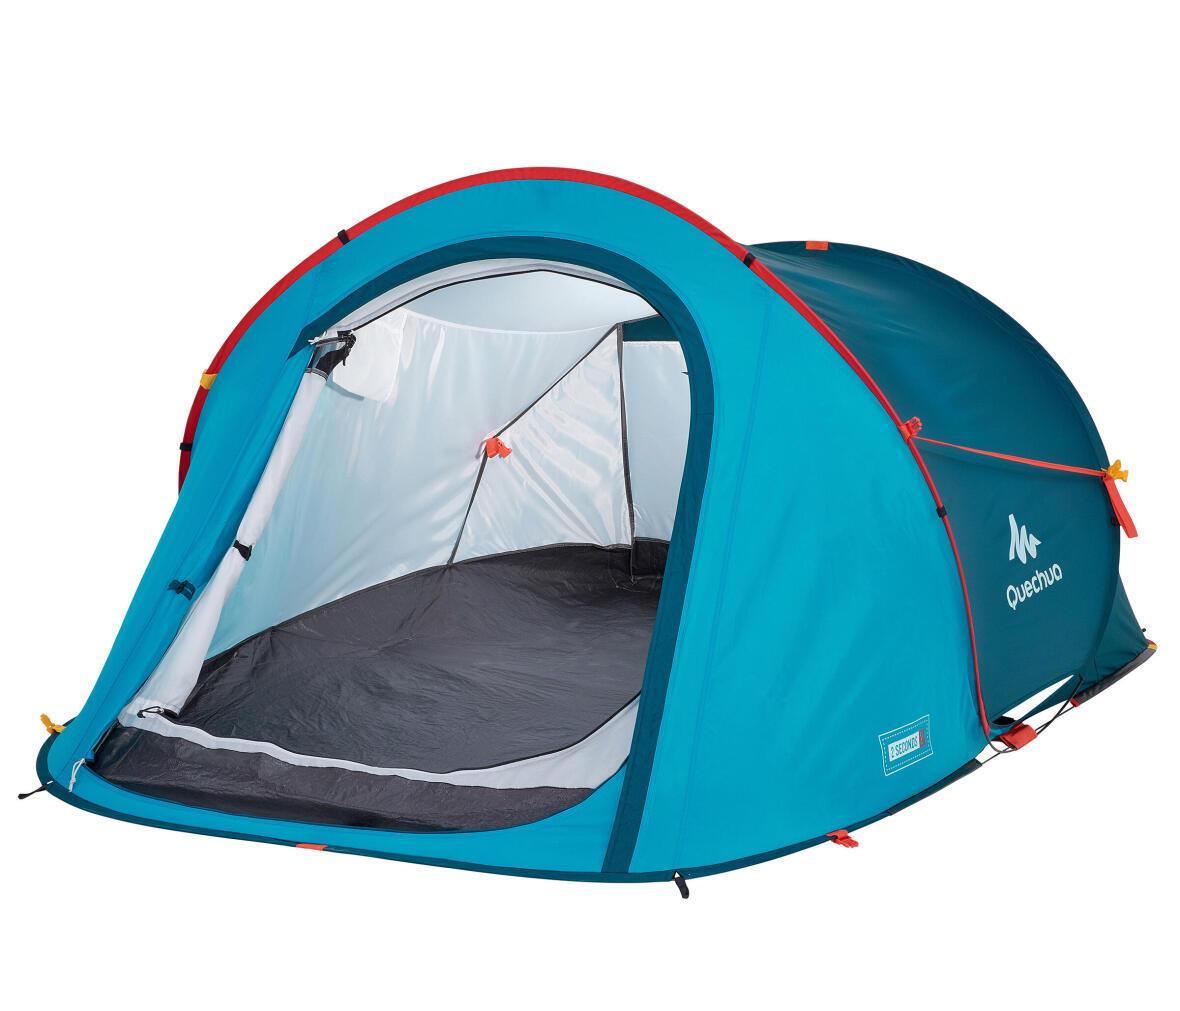 herstellen-tent-2seconds-2-personen-quechua-beschadigd